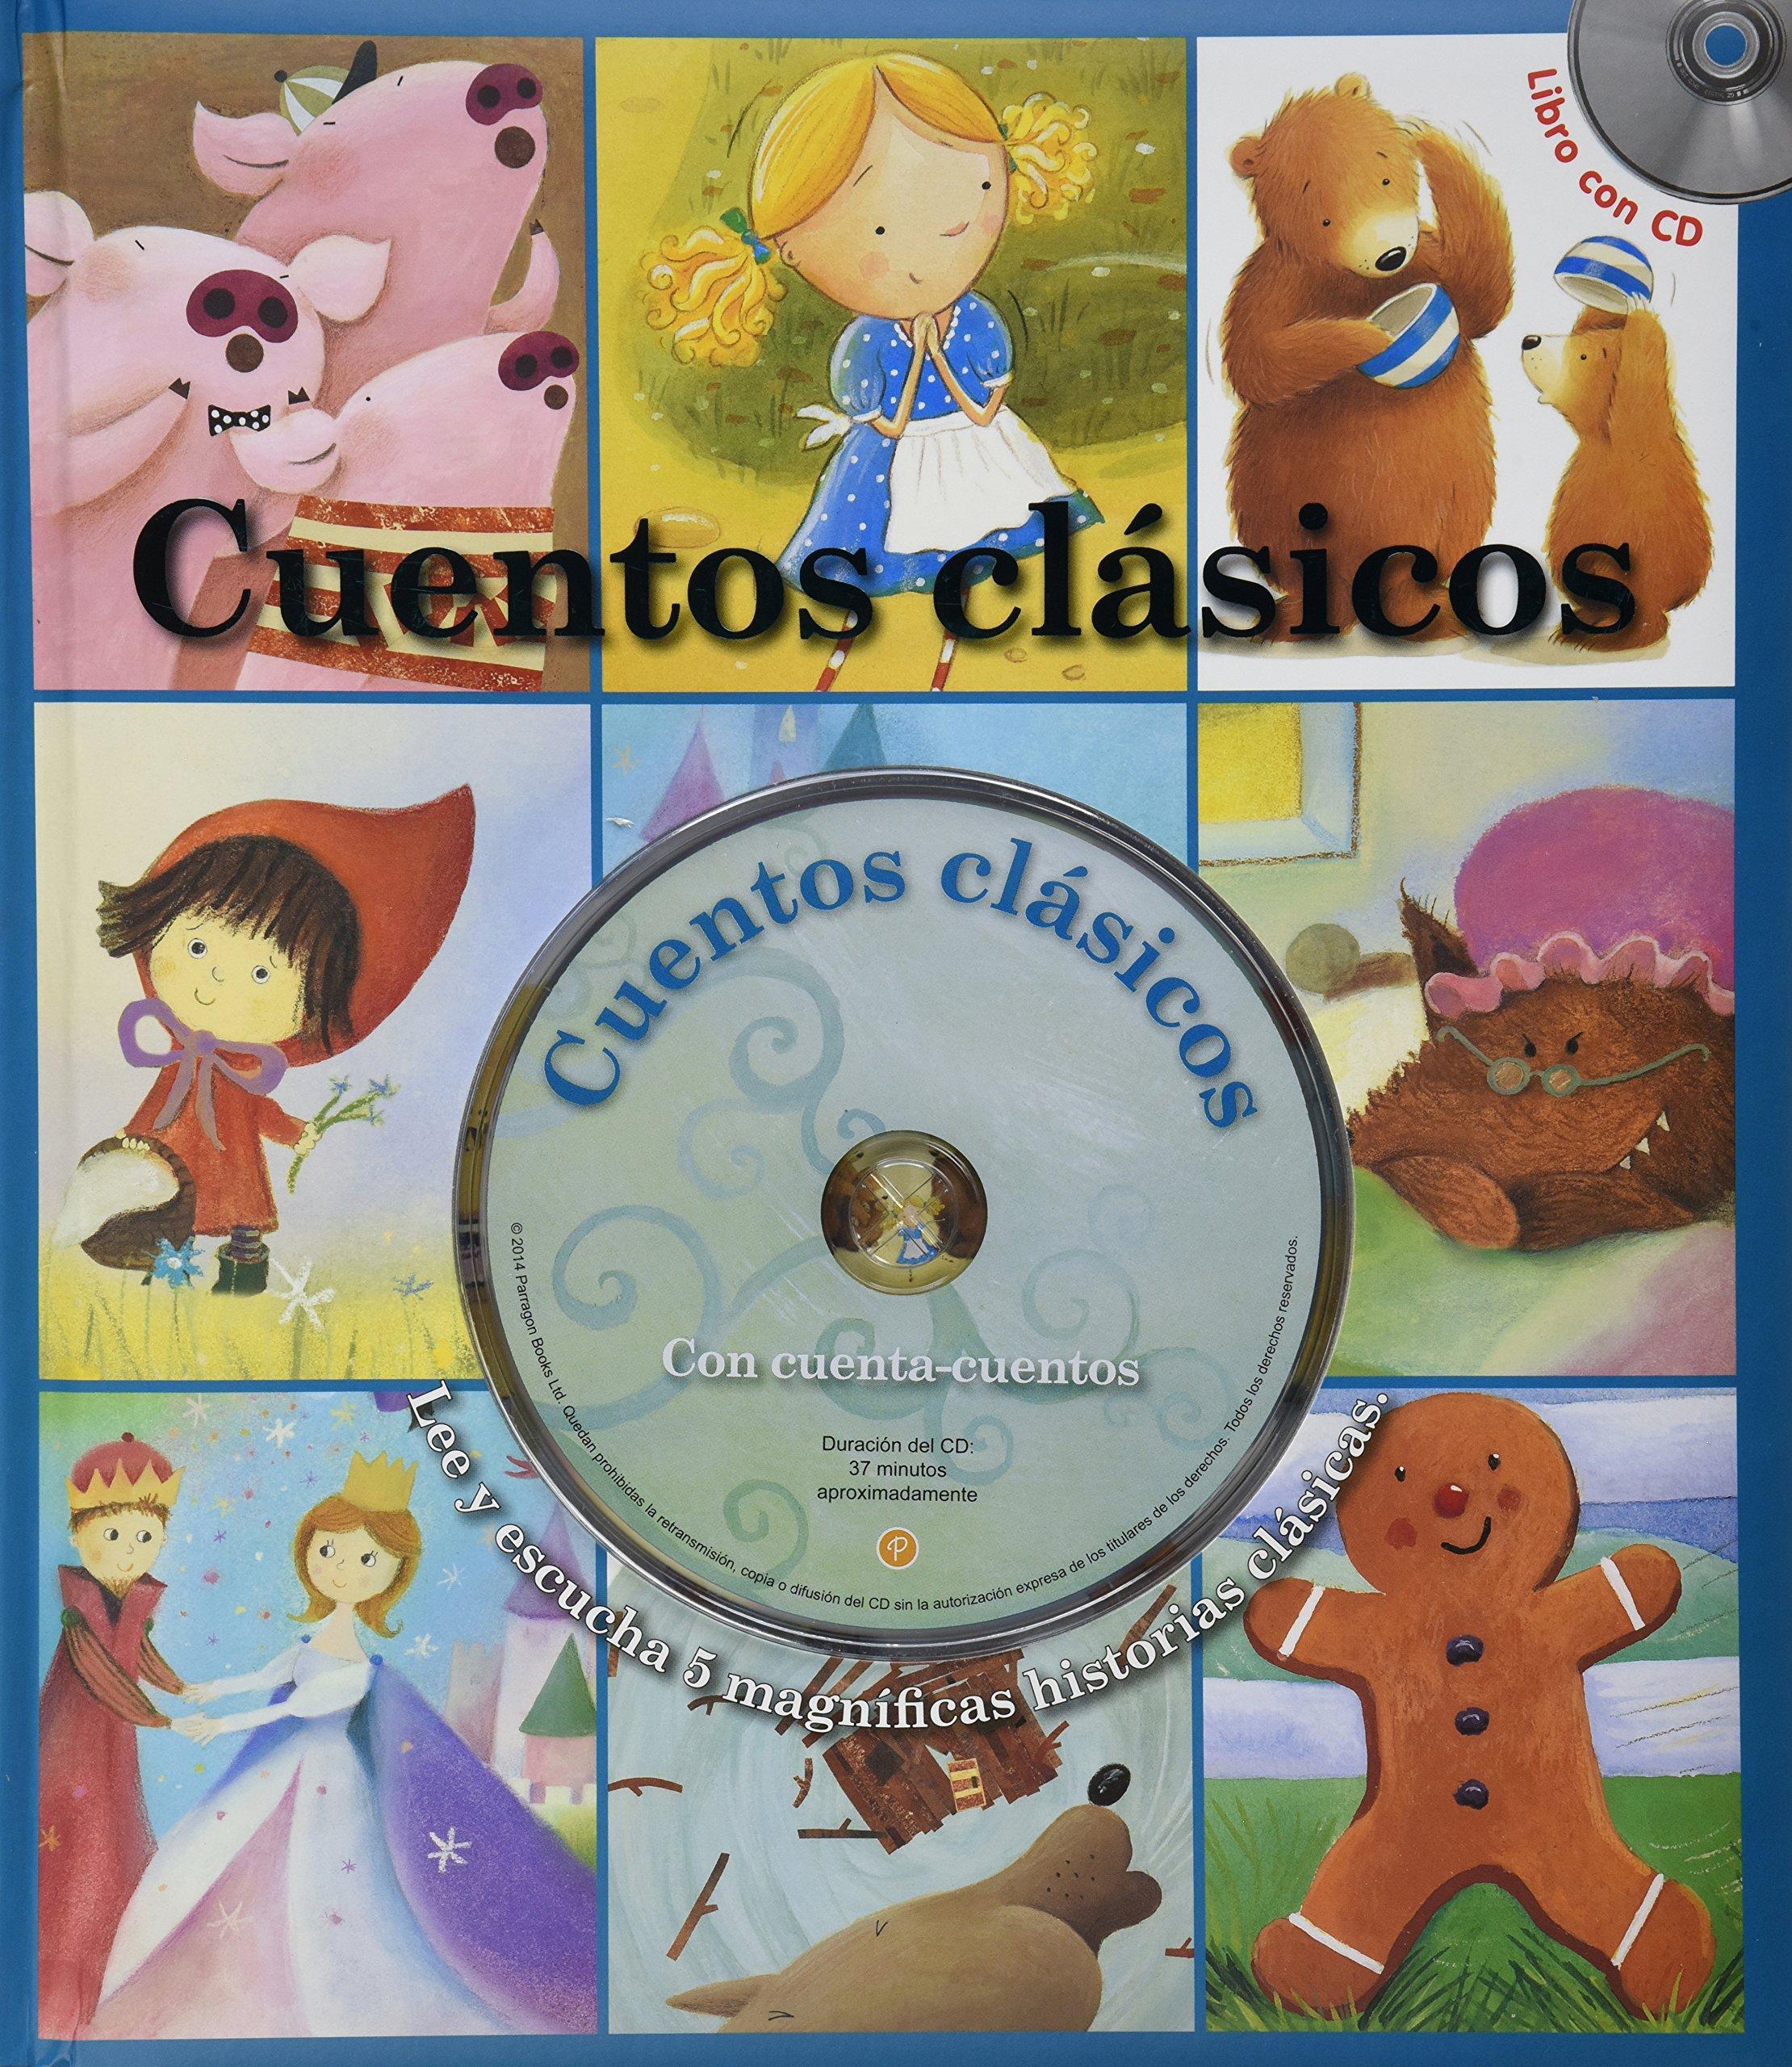 Cuentos Clasicos (Spanish Edition) (Spanish) Hardcover – January 1, 2014